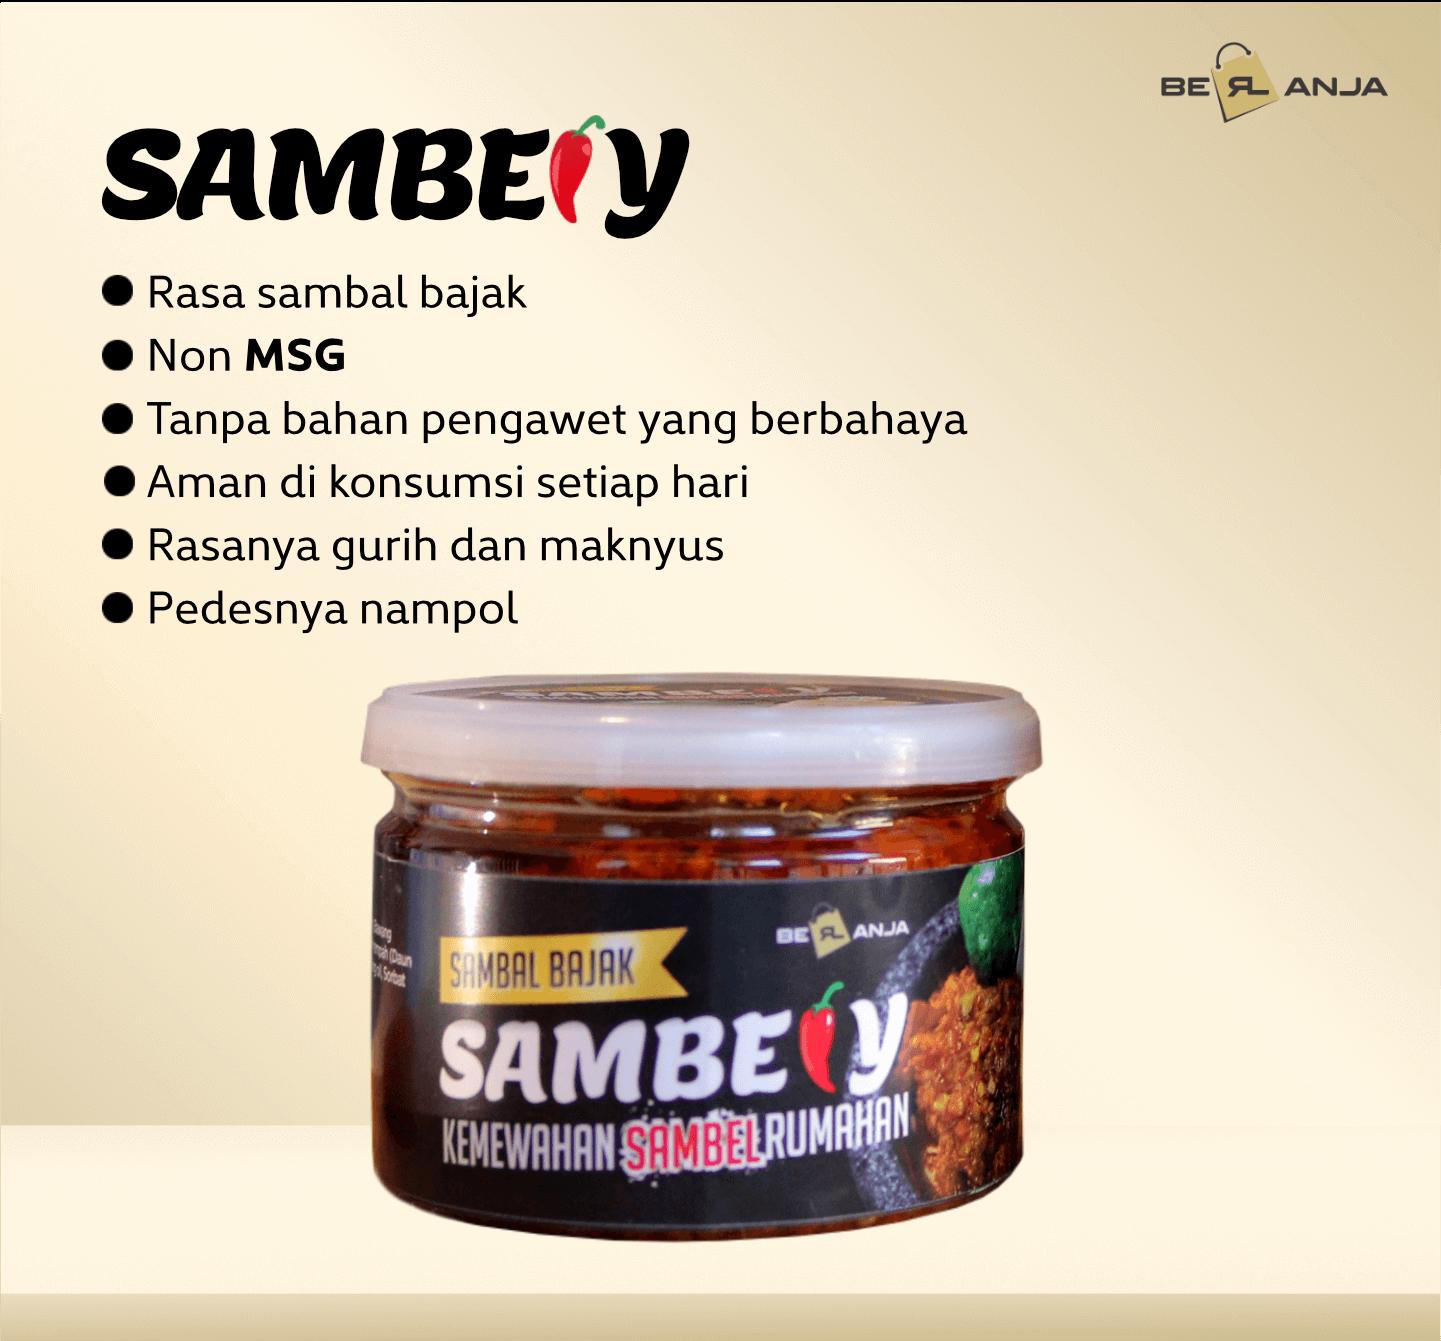 Sambely